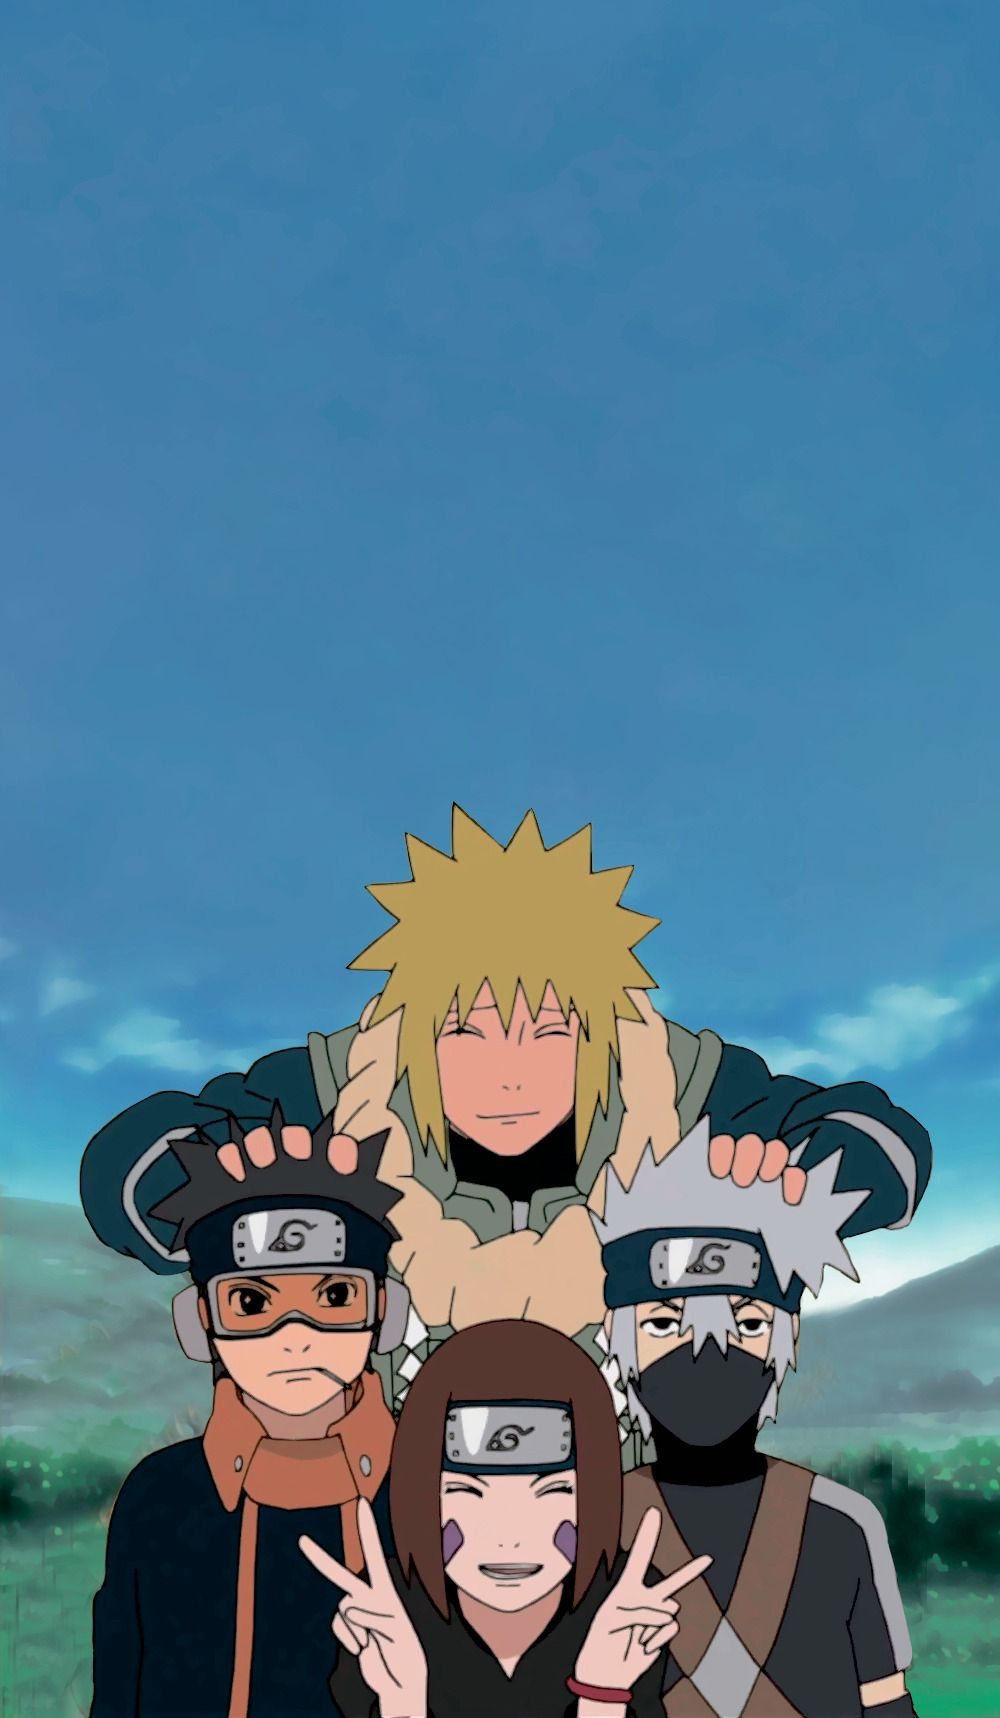 Team Minato Fondos De Pantalla De Naruto 433762 Hd